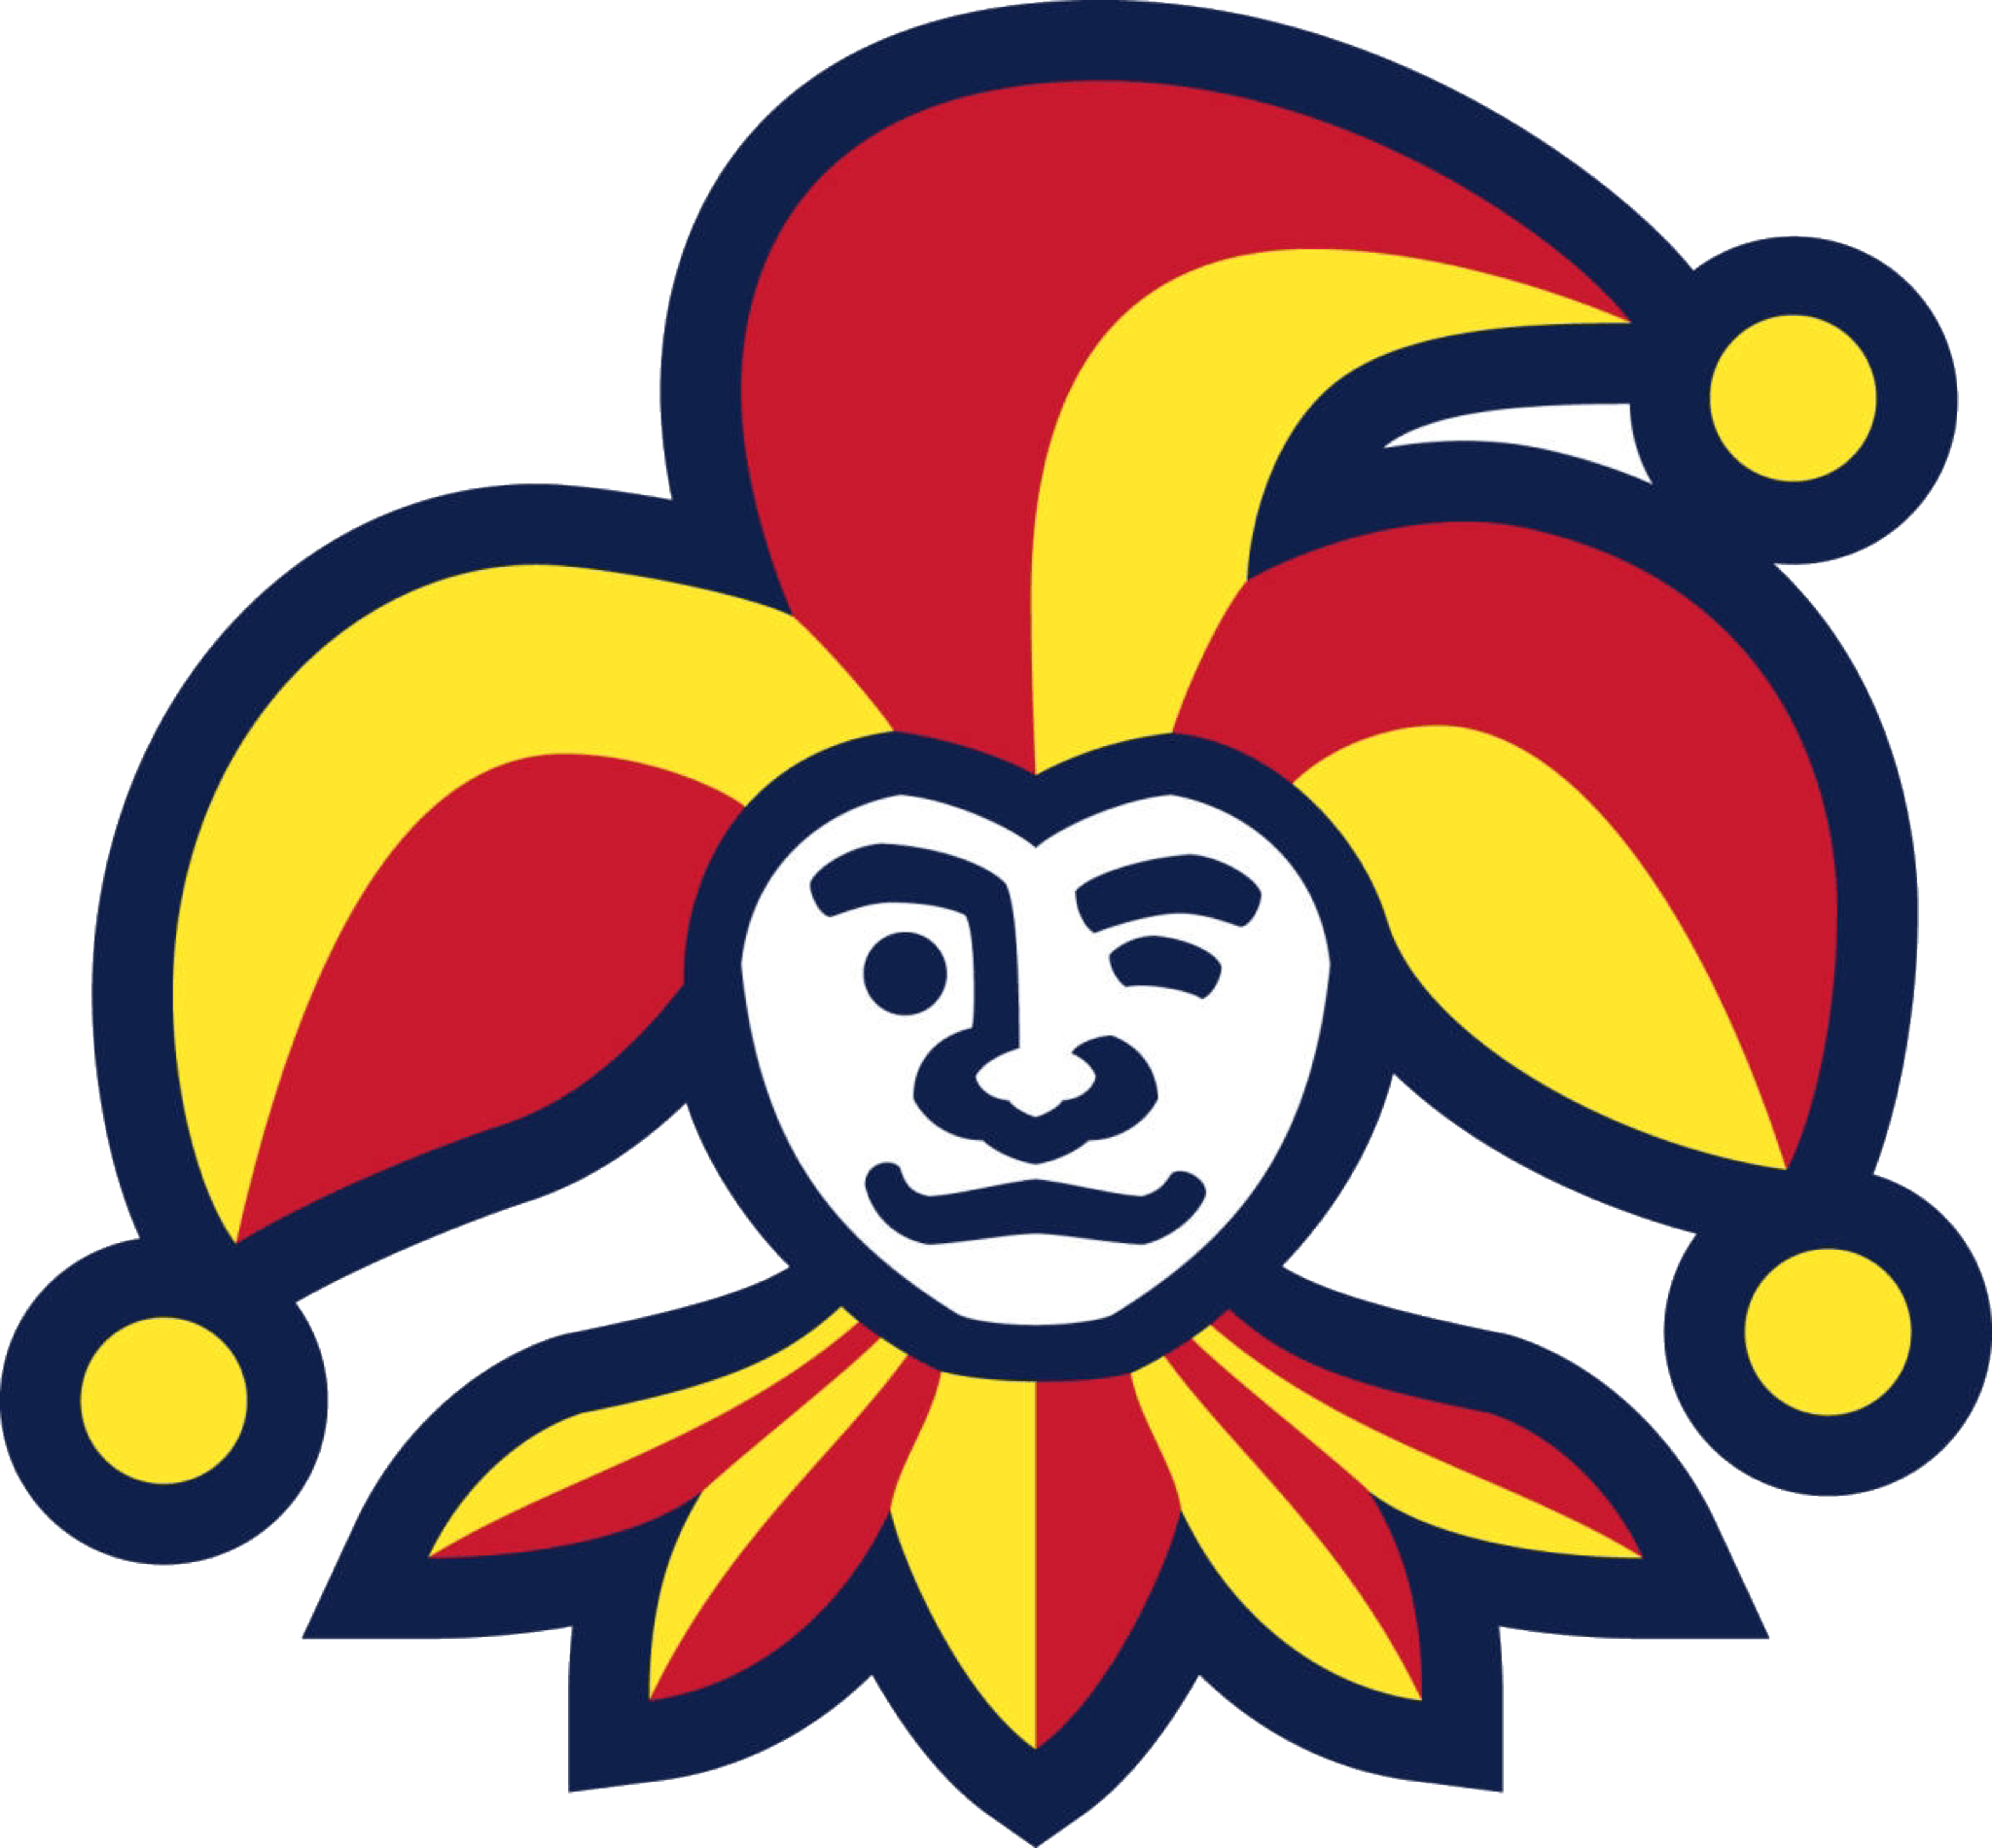 Helsingin Jokerit Ry urheiluseuran logo